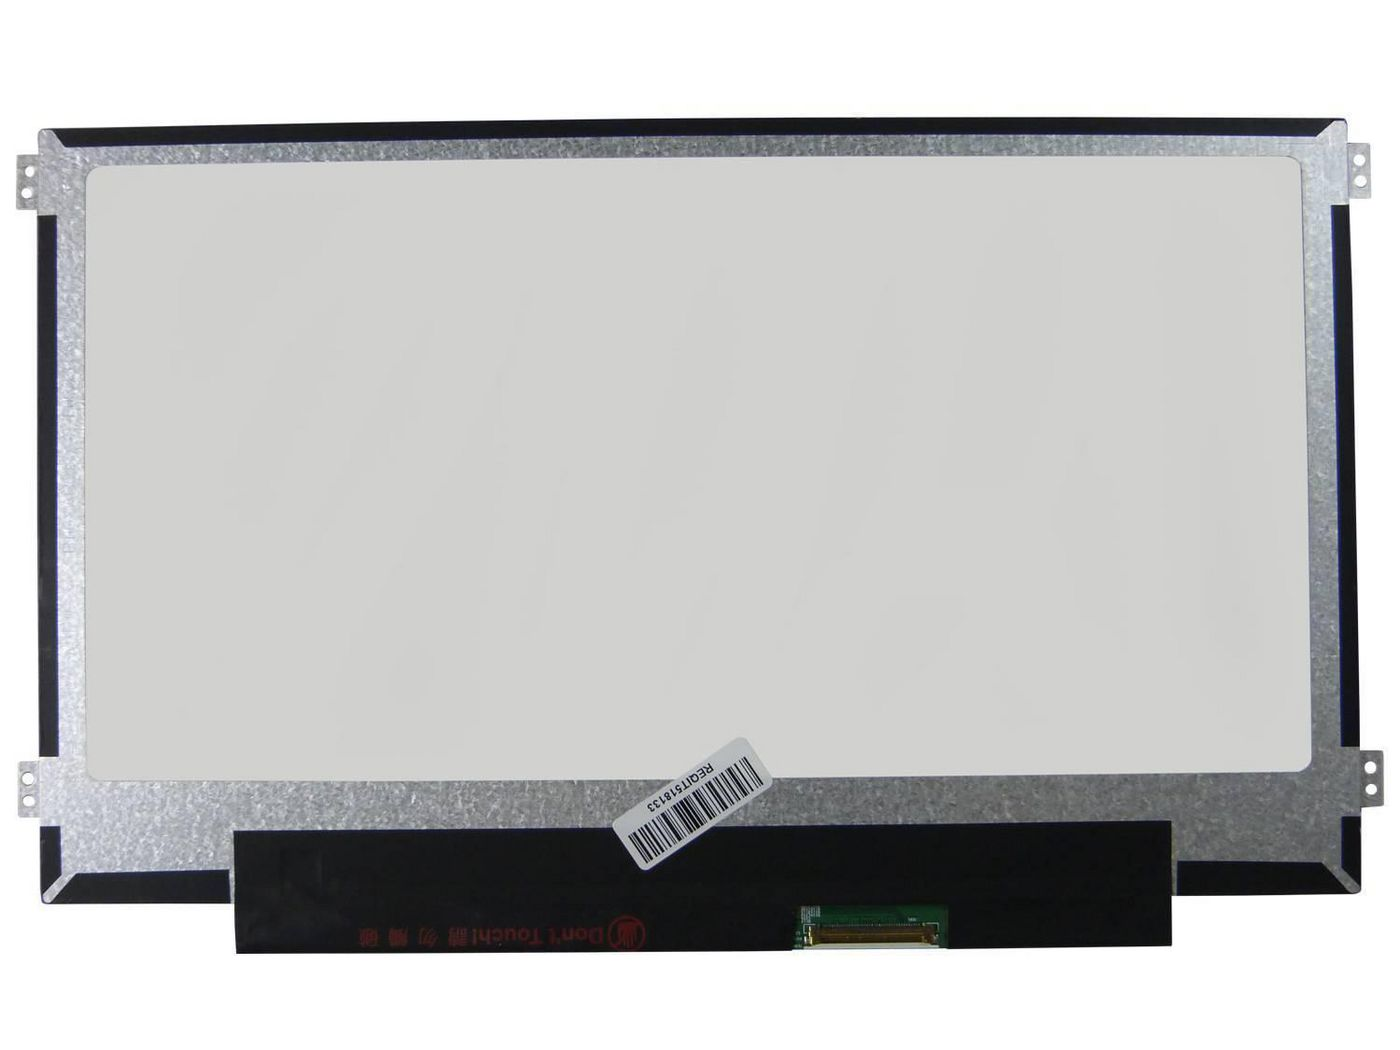 CoreParts MSC116H40-206G 11,6 LCD HD Glossy